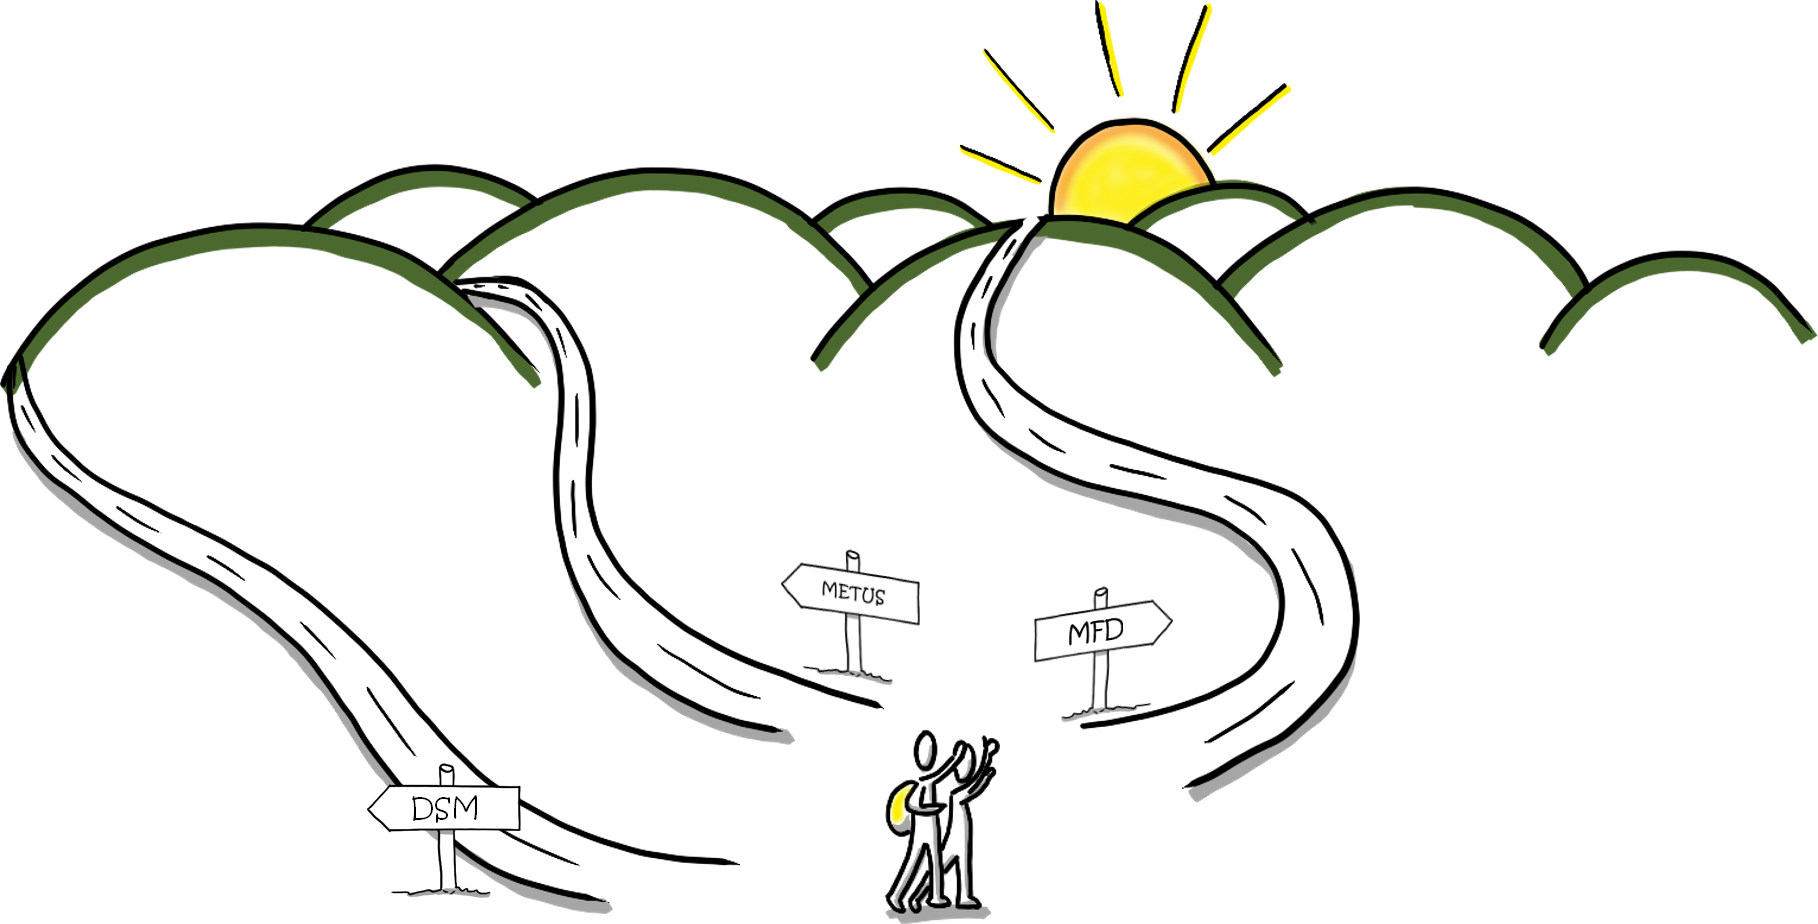 Wege-Methoden-Modularisierung.png